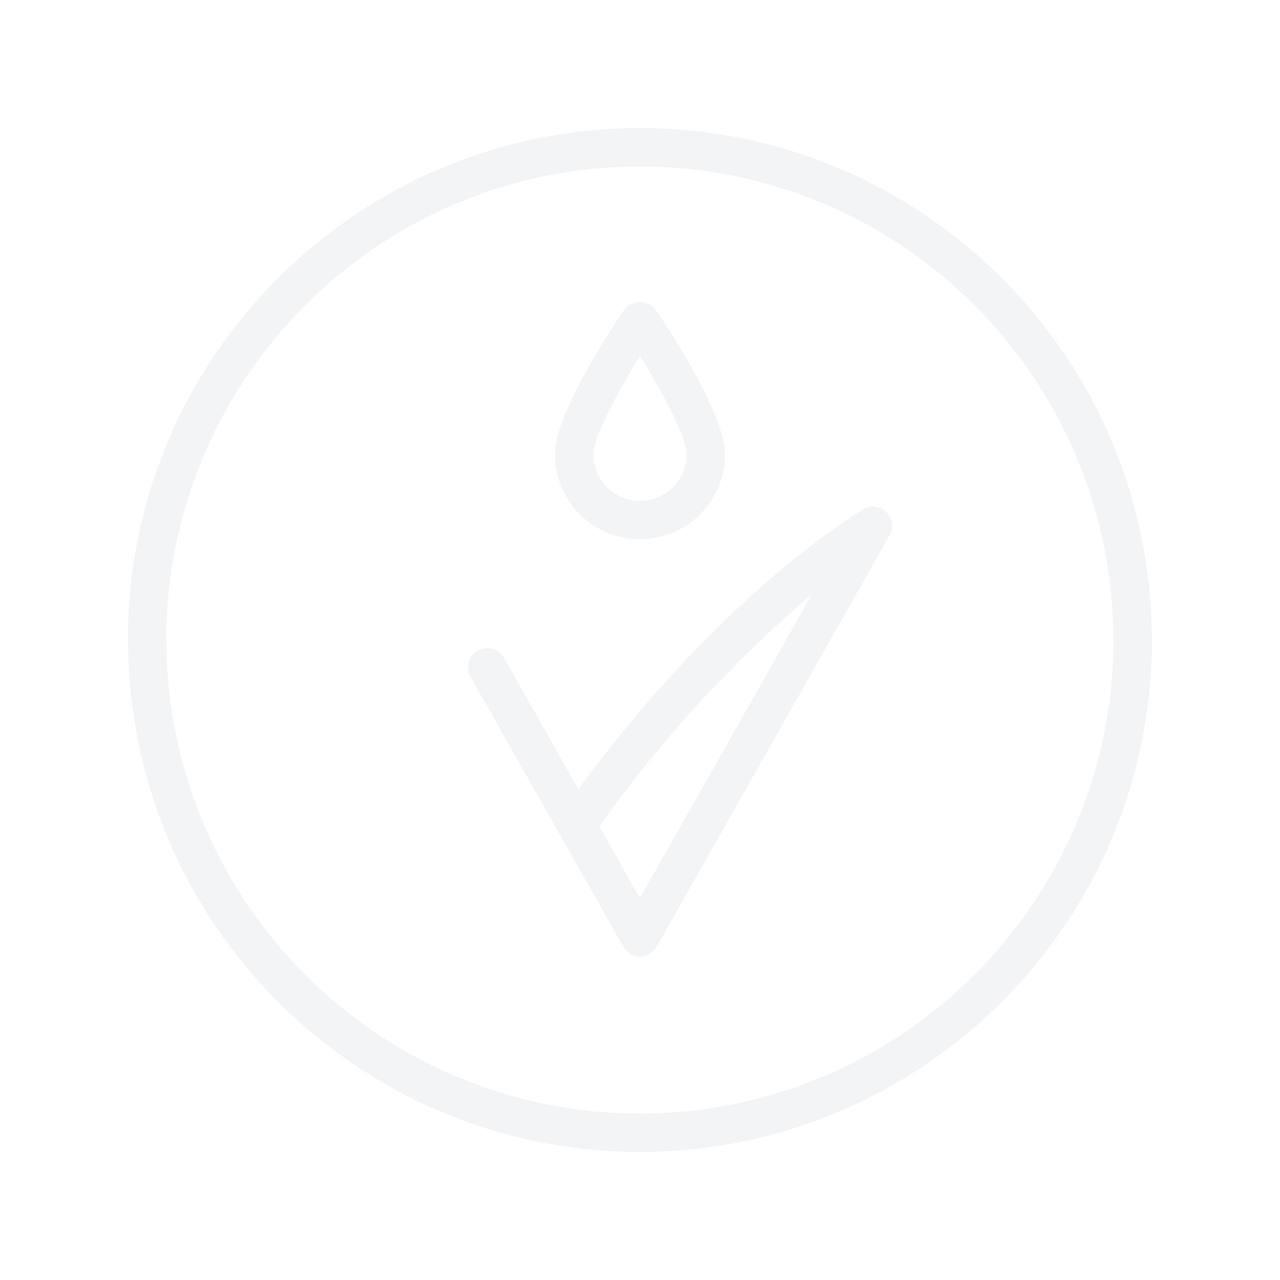 E.L.F. Sunkissed Glow Bronzer 5g